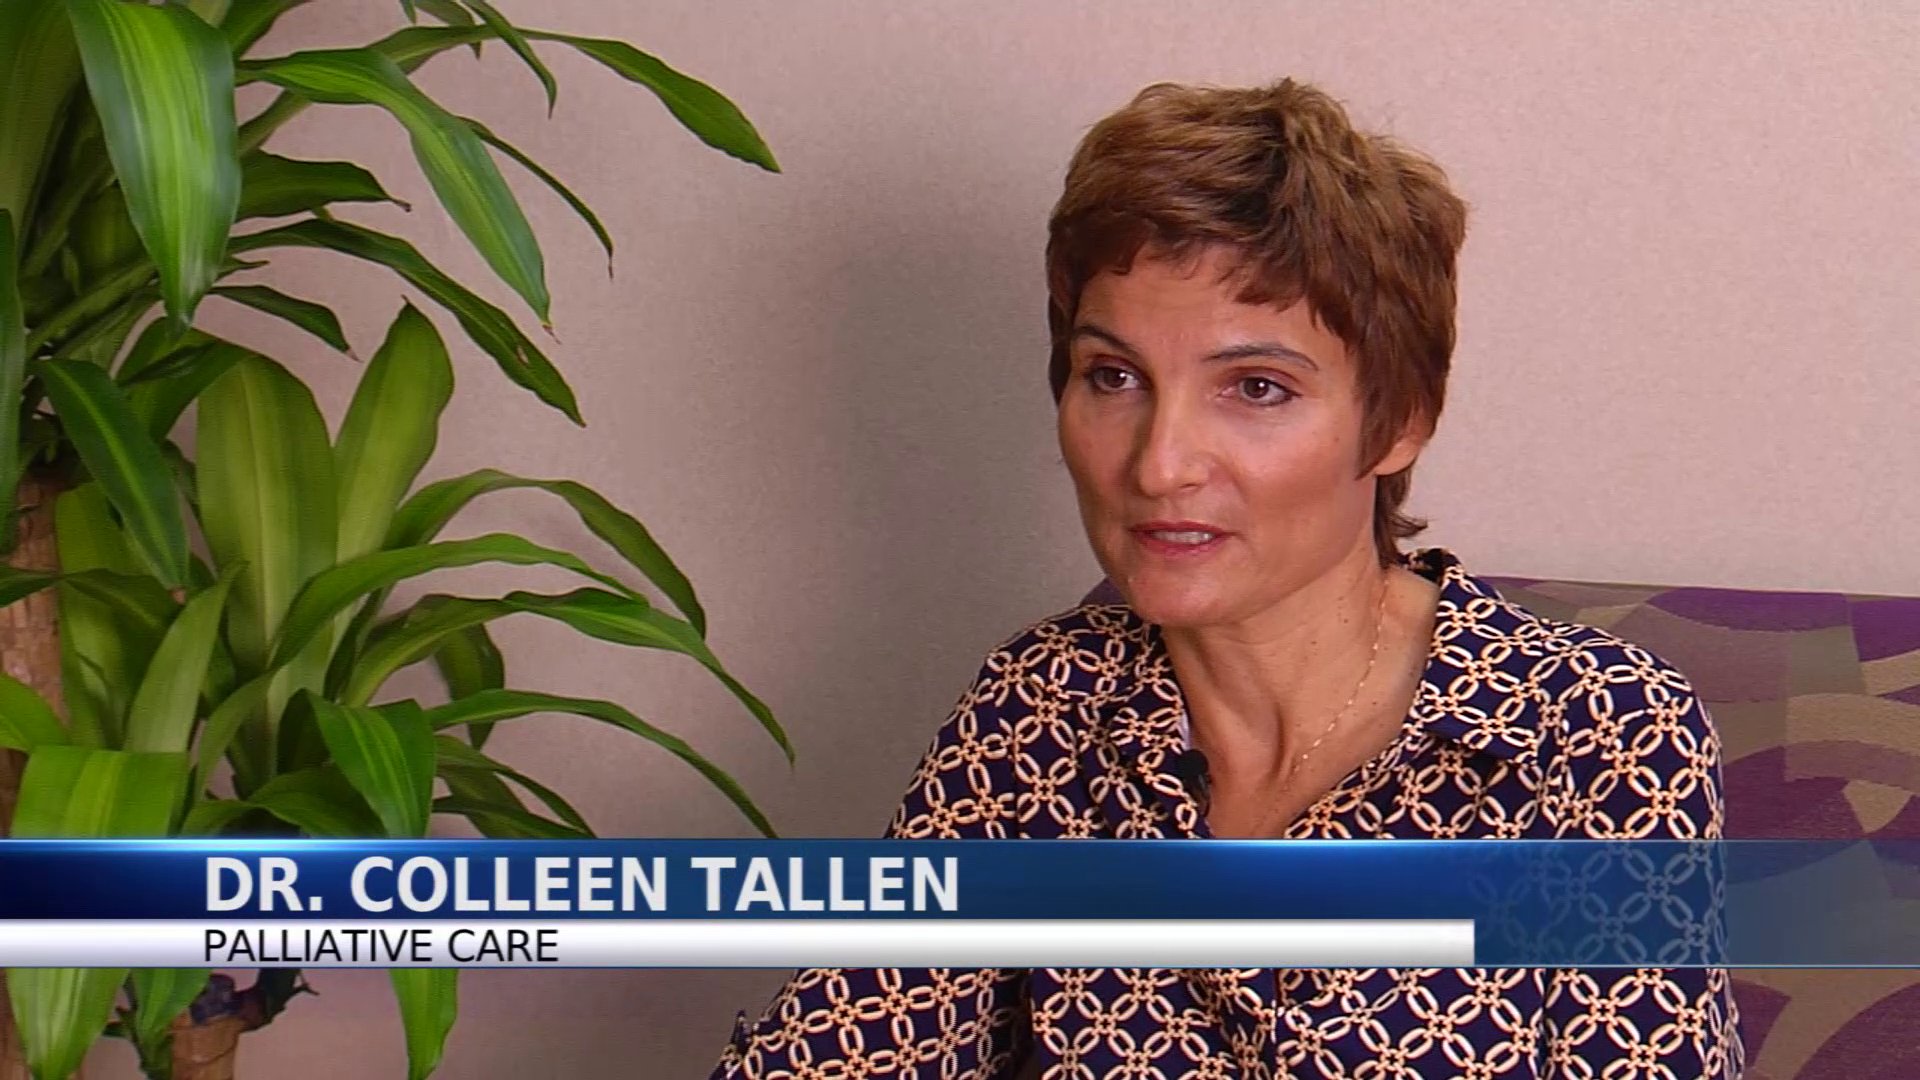 Dr. Tallen talks about her practice